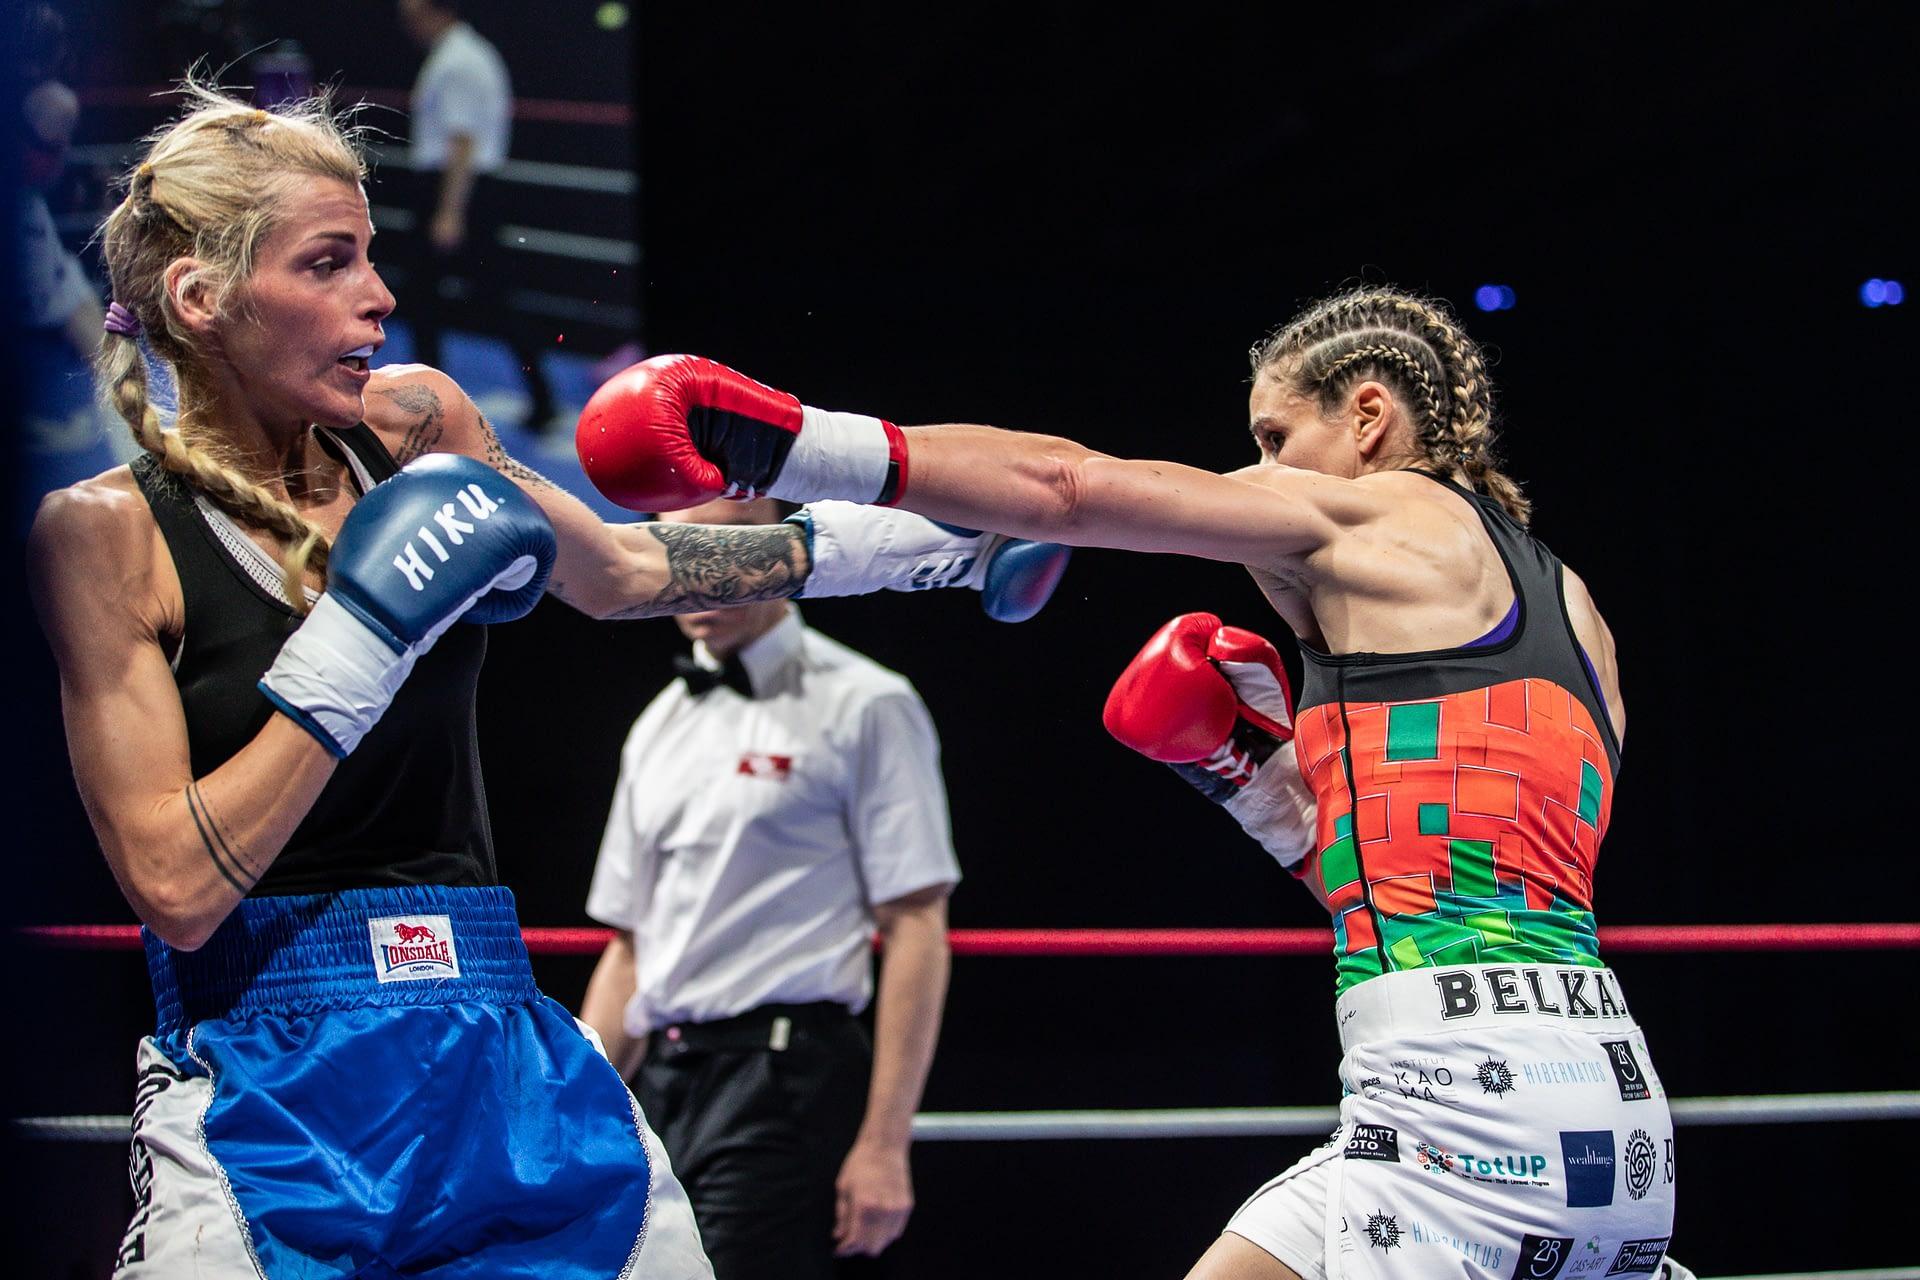 Olivia BOA Boudouma vs. Bianka Majlath by STEMUTZ, Forum Fribourg, 14.12.2019